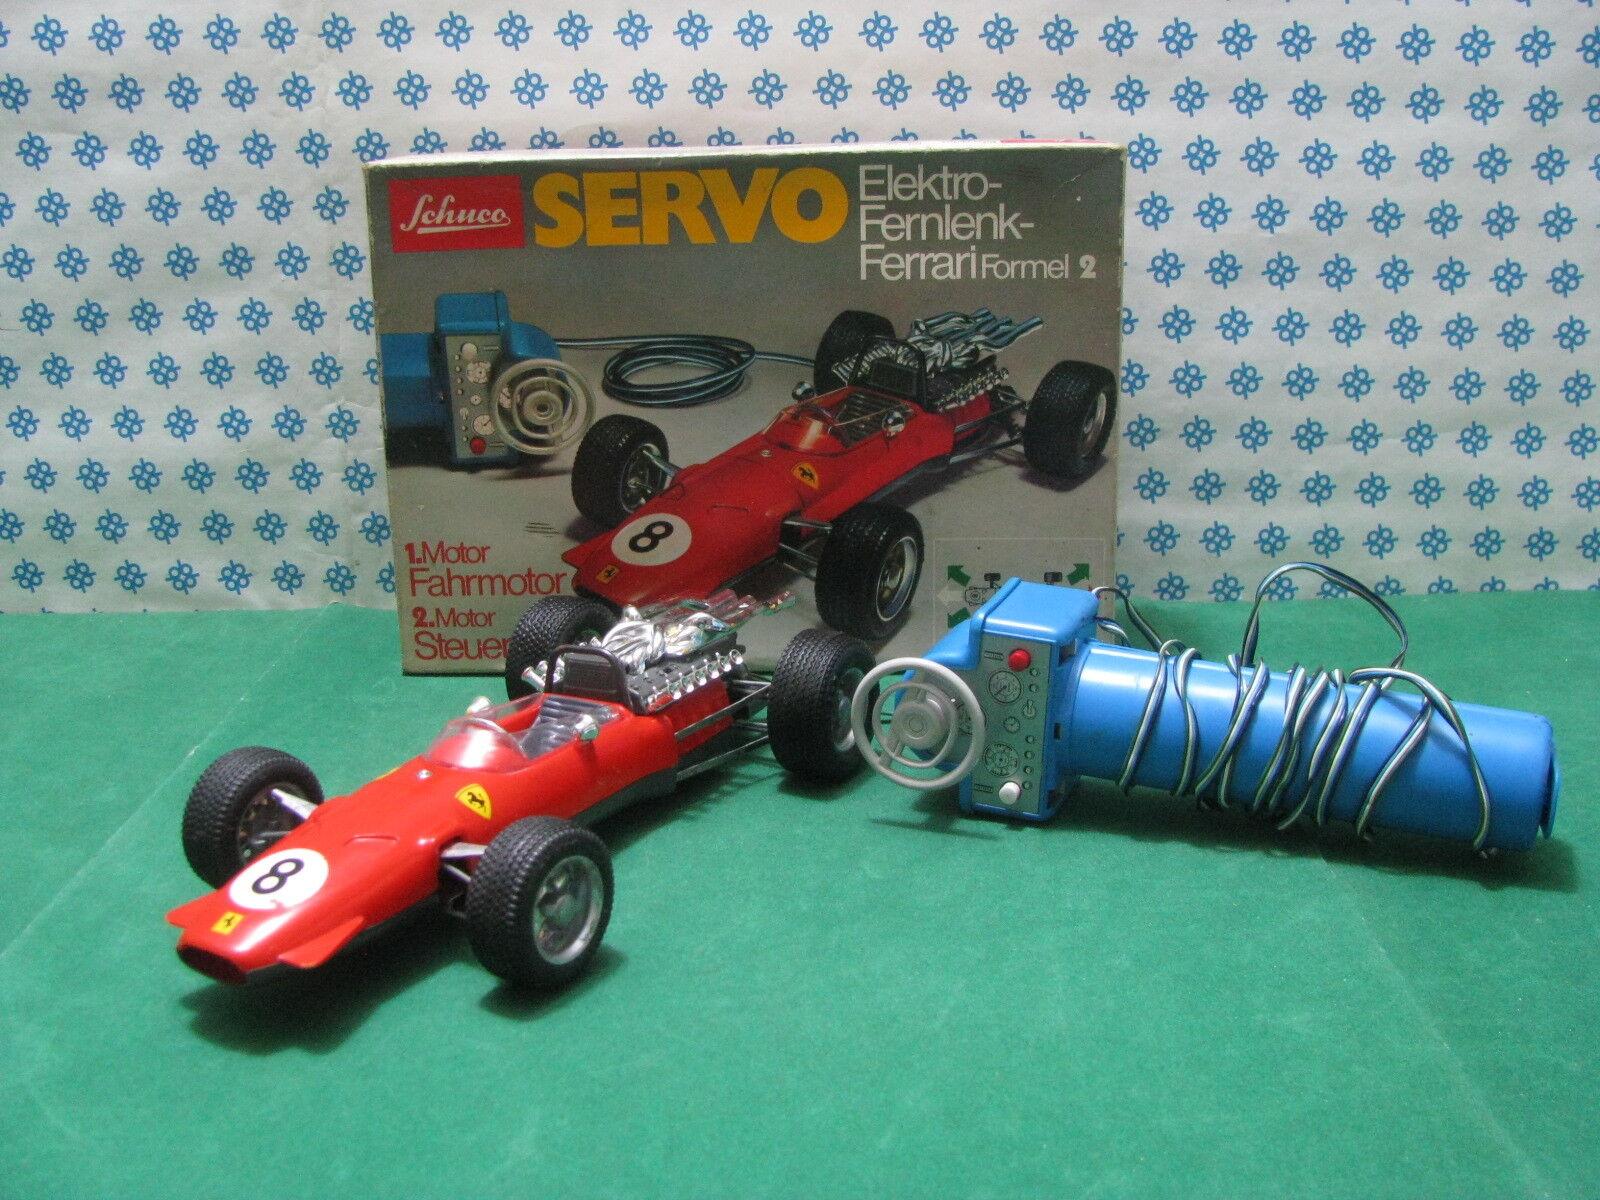 RARE  Vintage SCHUCO SERVO  - FERRARI  Formel 2  - Elektro-Fernlenk 5312